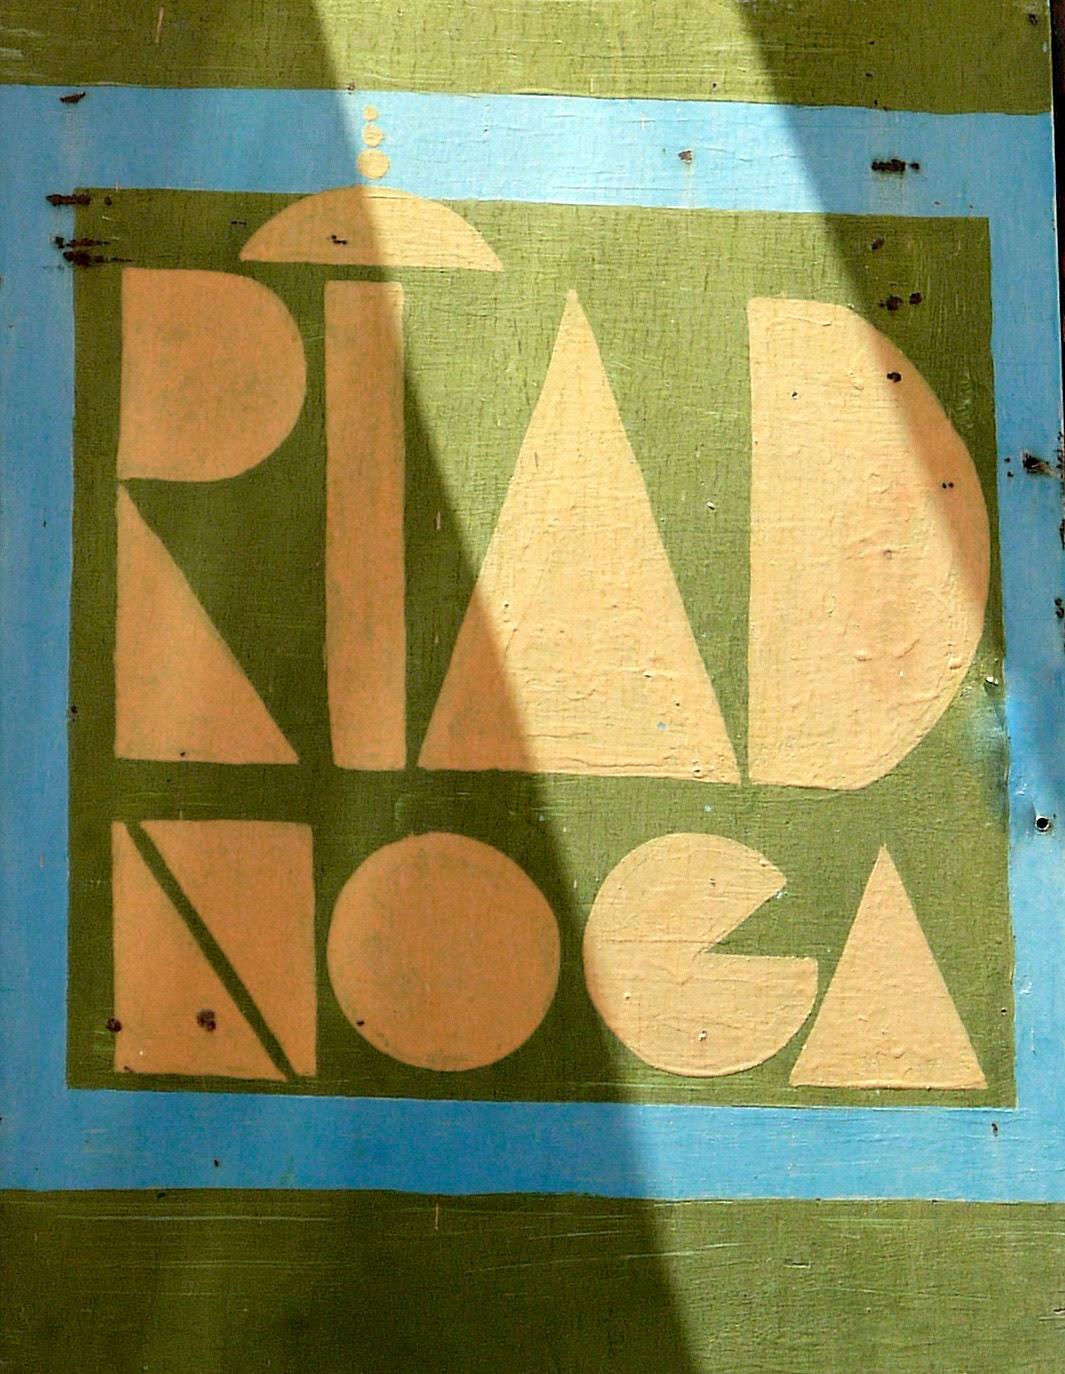 Riad Noga Sign